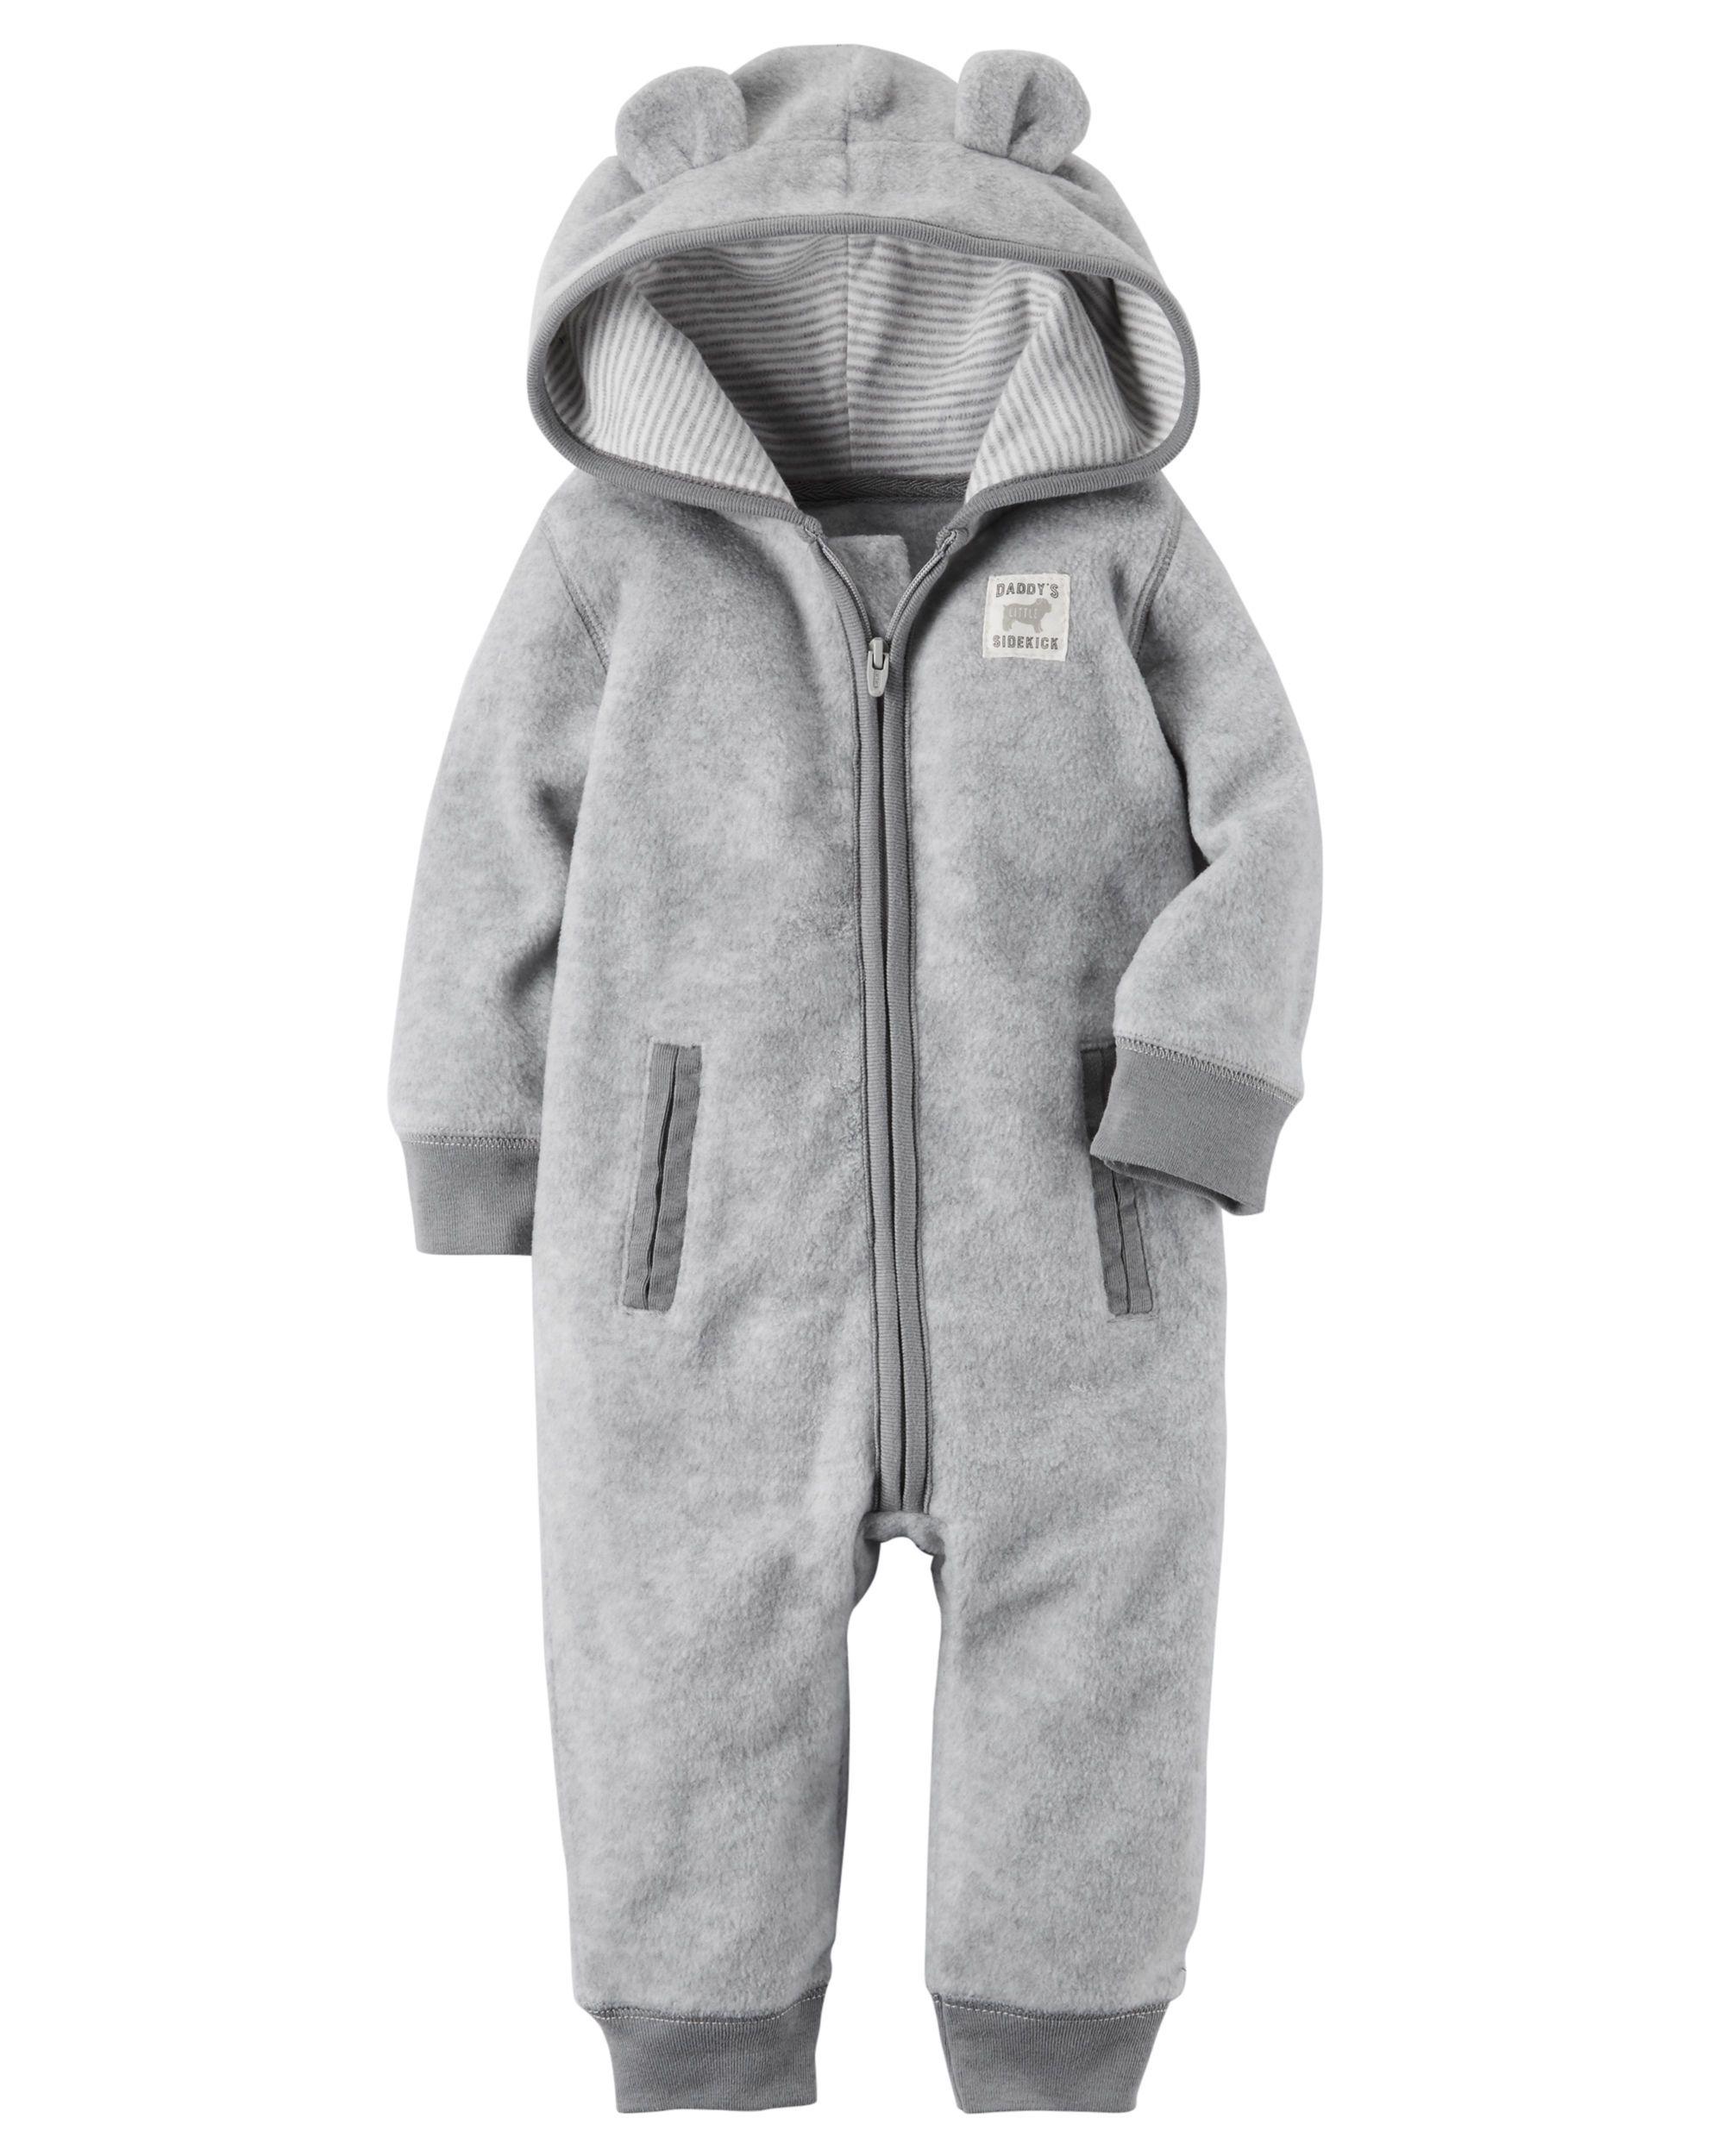 0a75d1049fc0 Baby Boy Hooded Fleece Jumpsuit